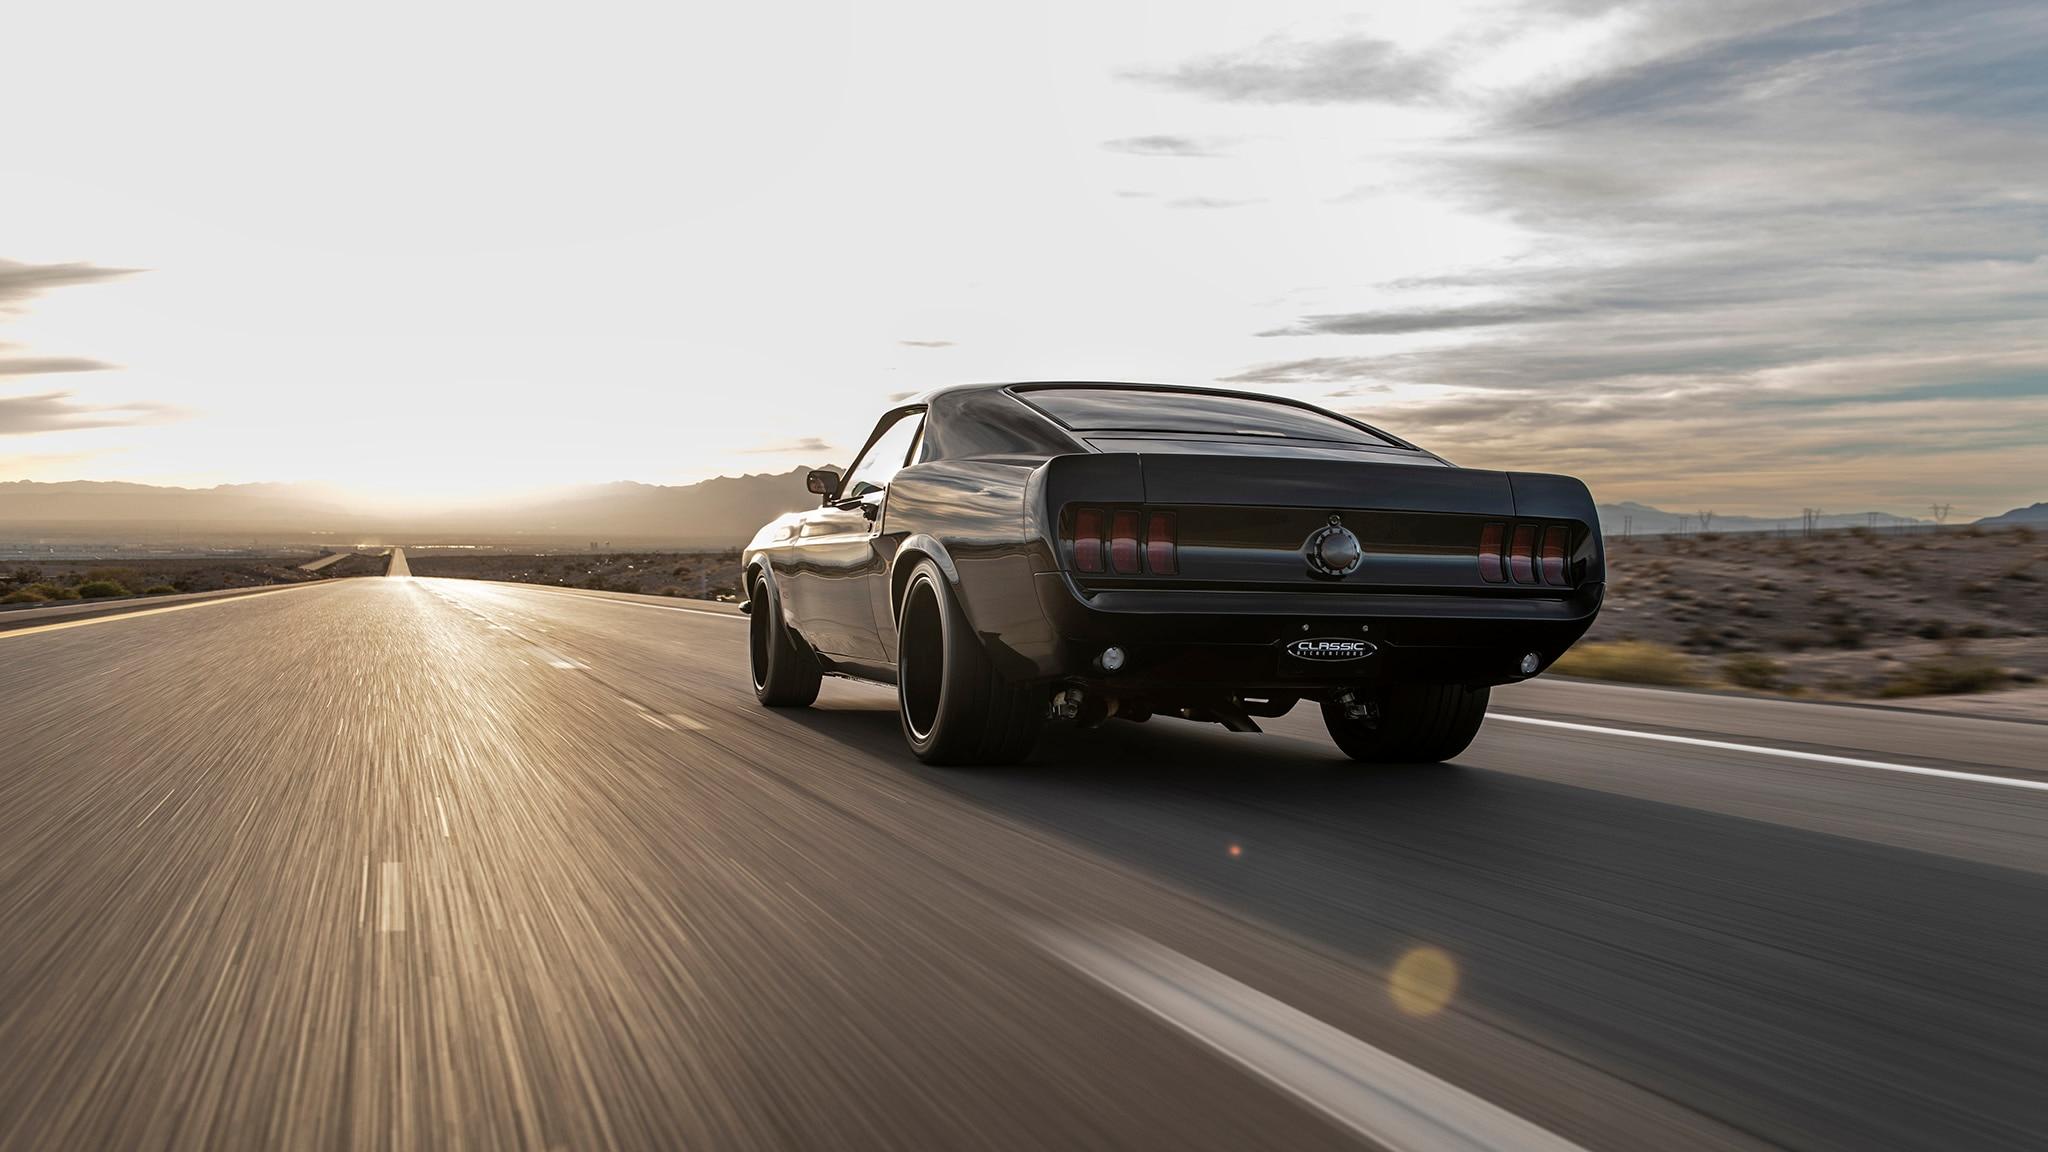 03 Classic Recreations 1969 Boss 429 Mustang